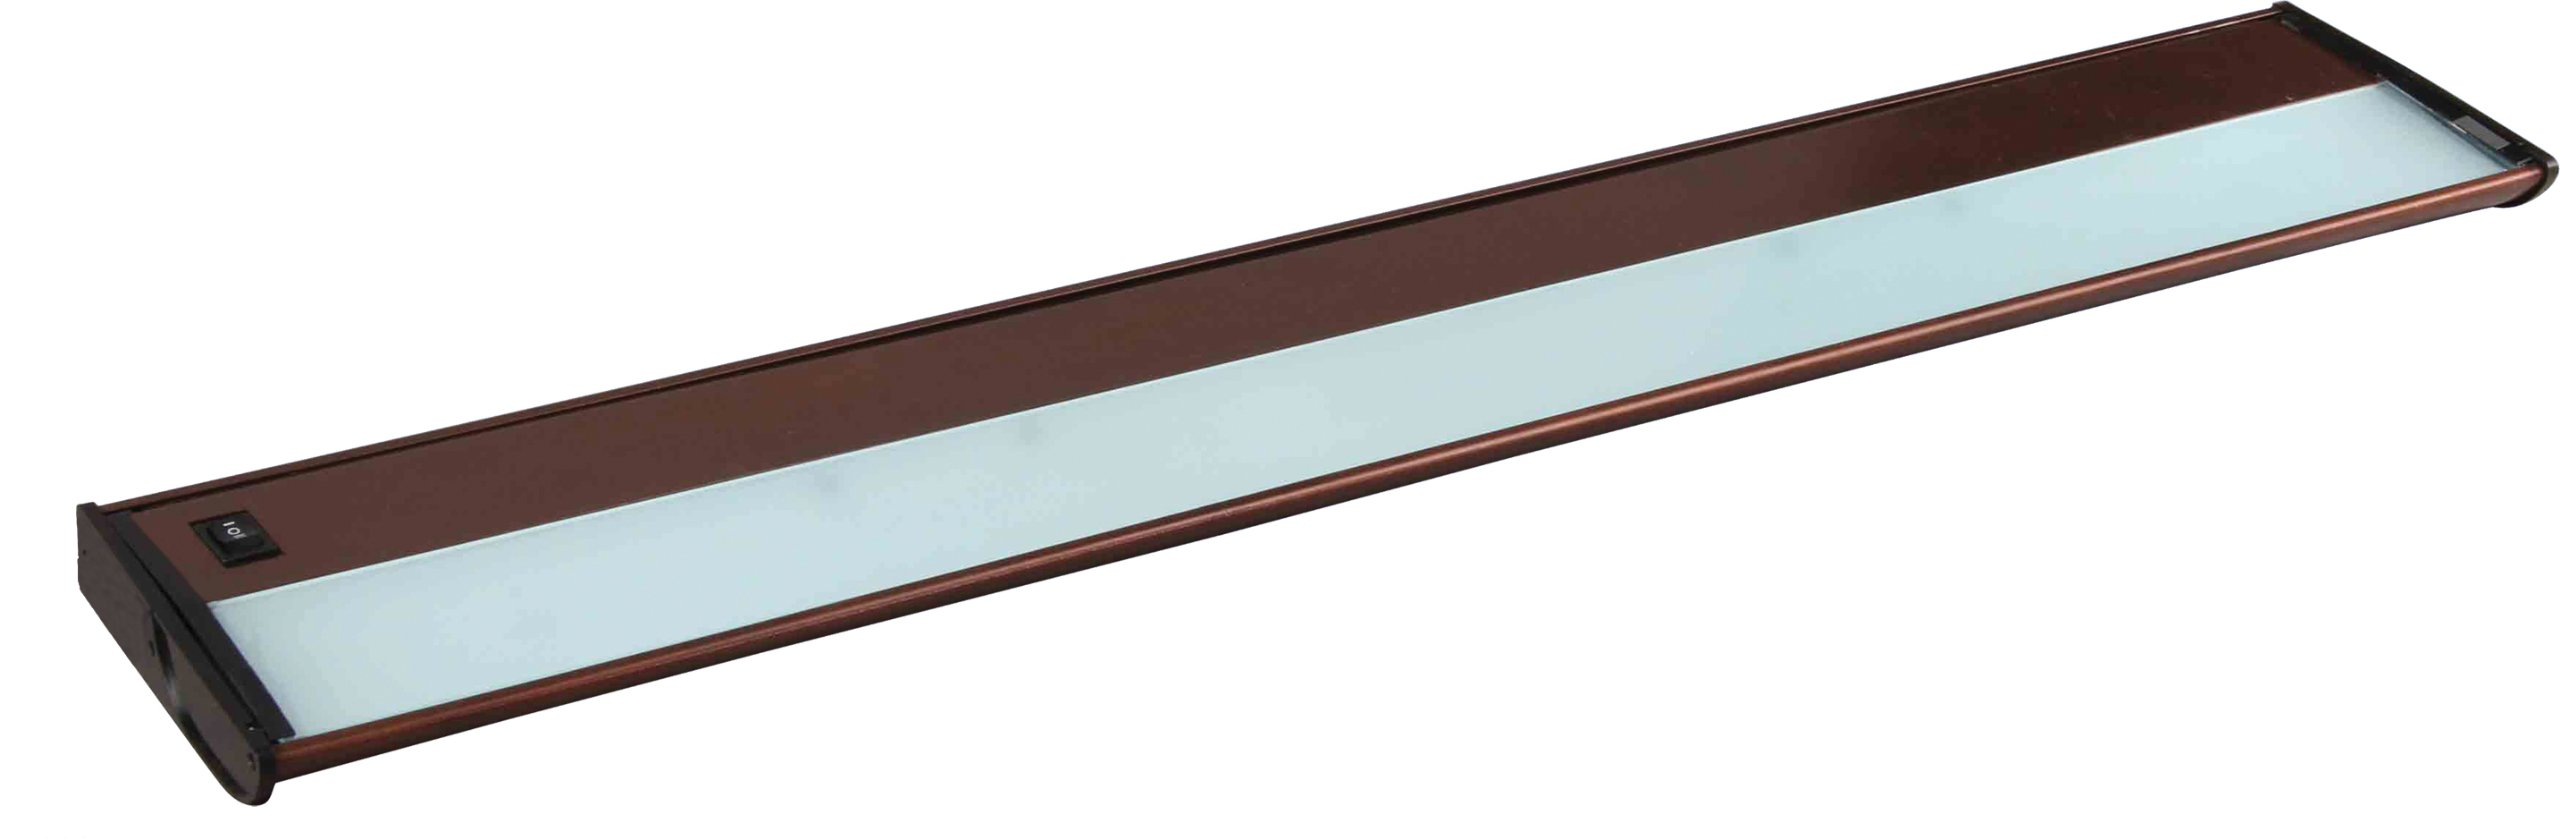 Maxim 87834MB CounterMax MX-X120 40'' 5-Light 120V Xenon, Metallic Bronze Finish, Glass, G8 Xenon Xenon Bulb , 13W Max., Dry Safety Rating, 2700K Color Temp, Glass Shade Material, 900 Rated Lumens by Maxim Lighting